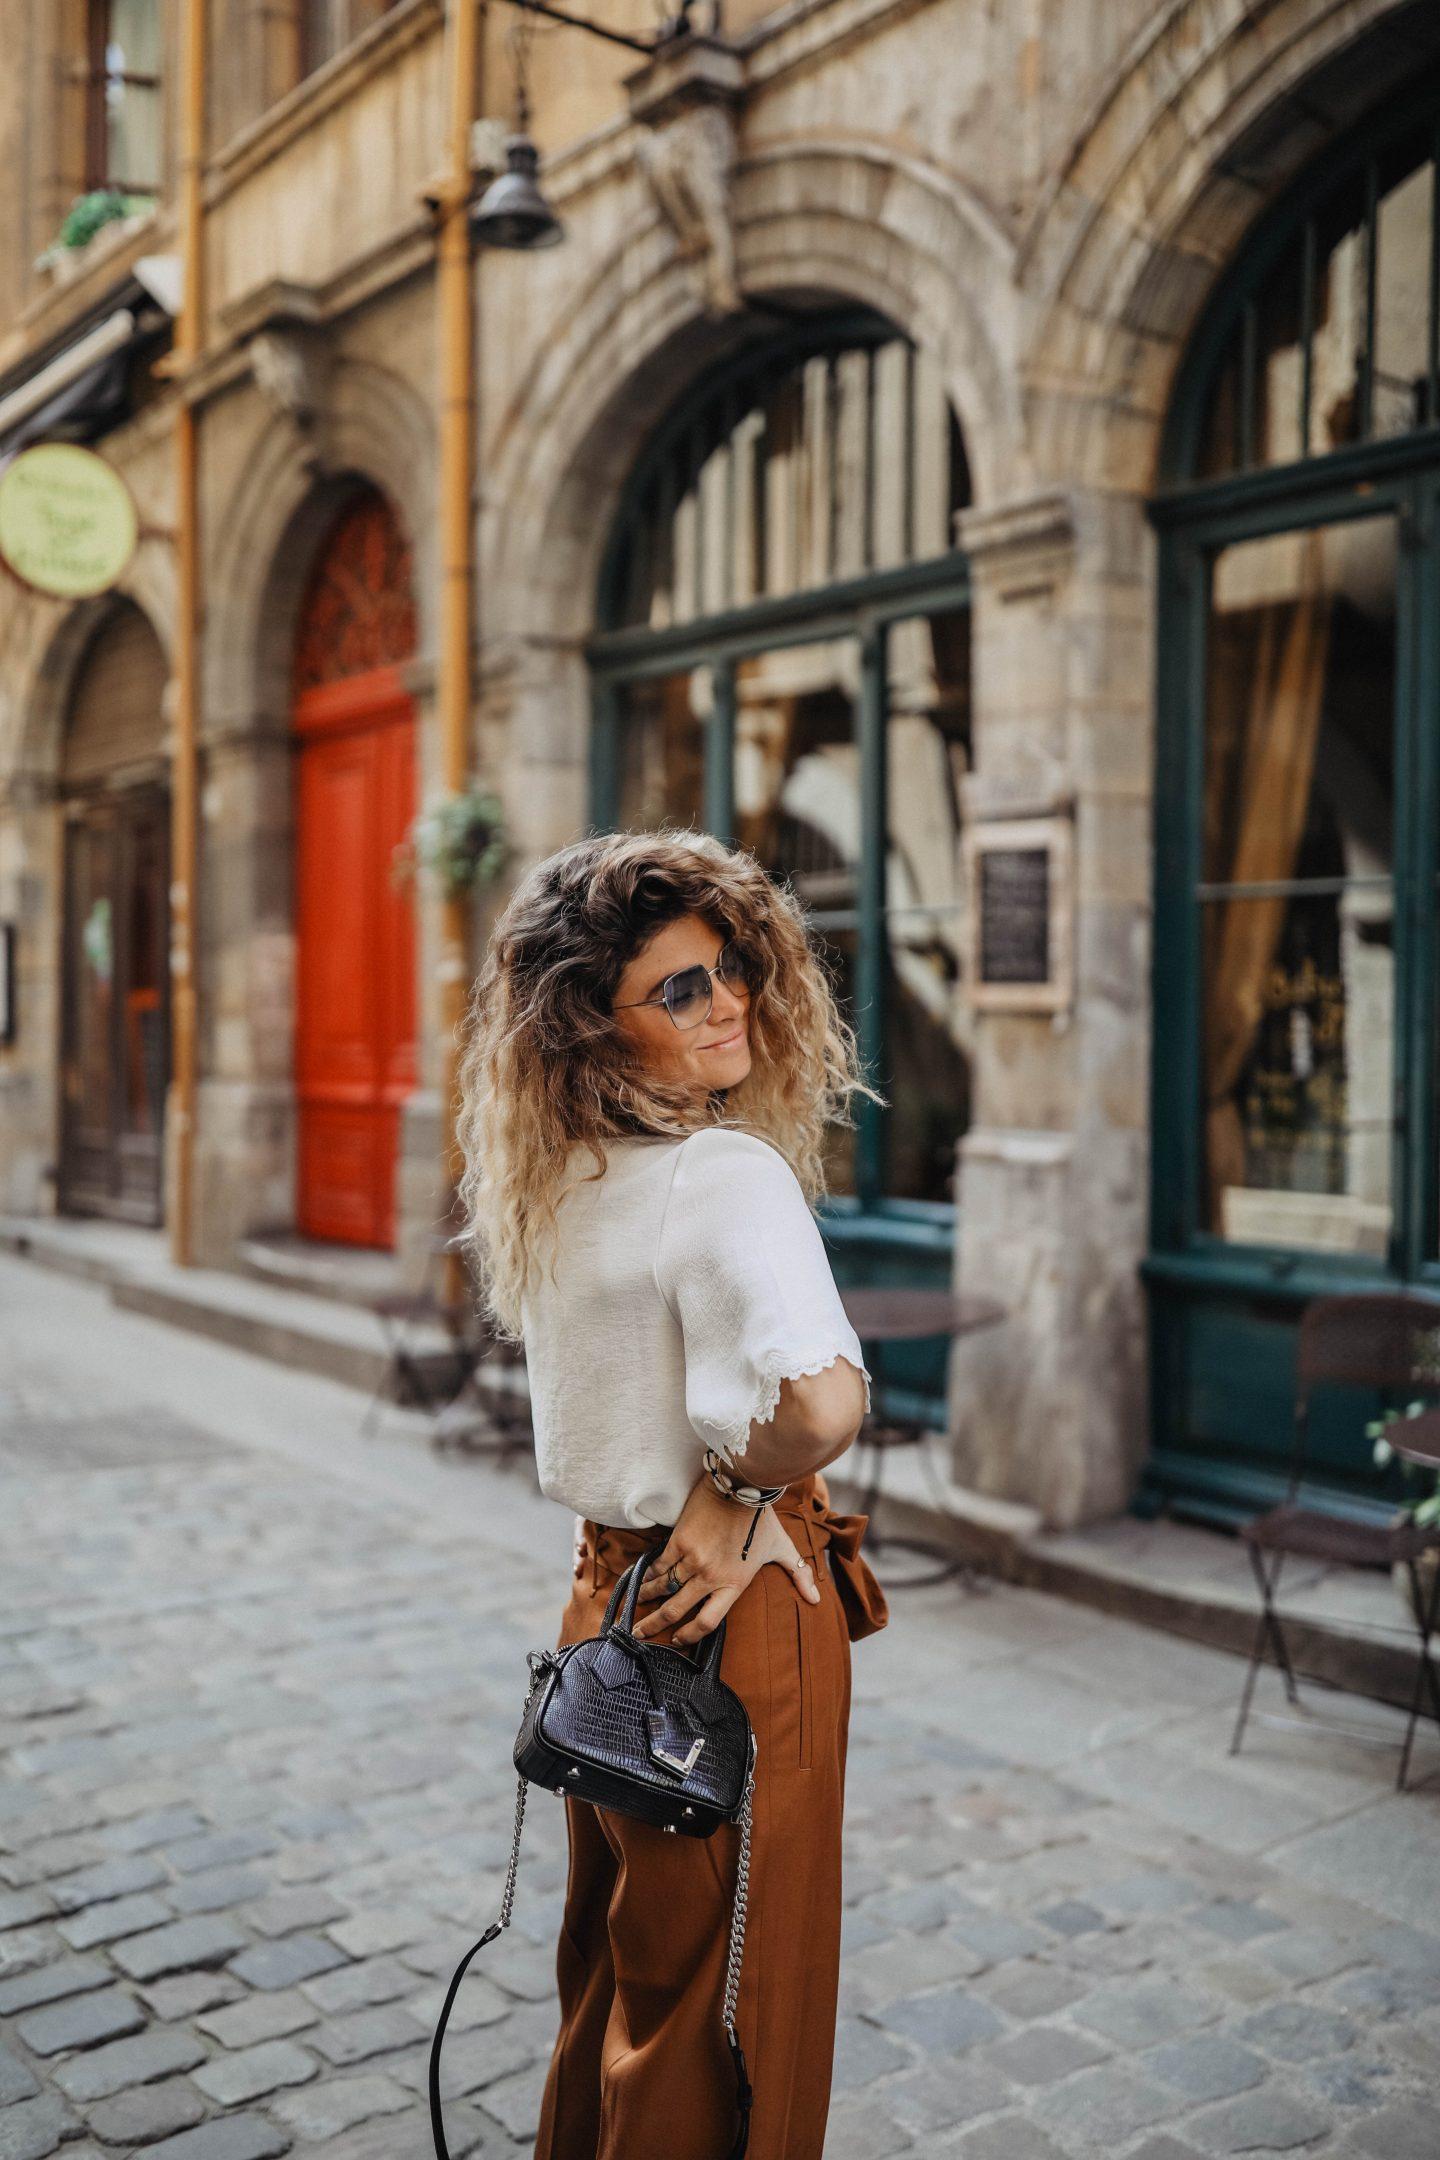 Lunette Bolone marieandmood blog